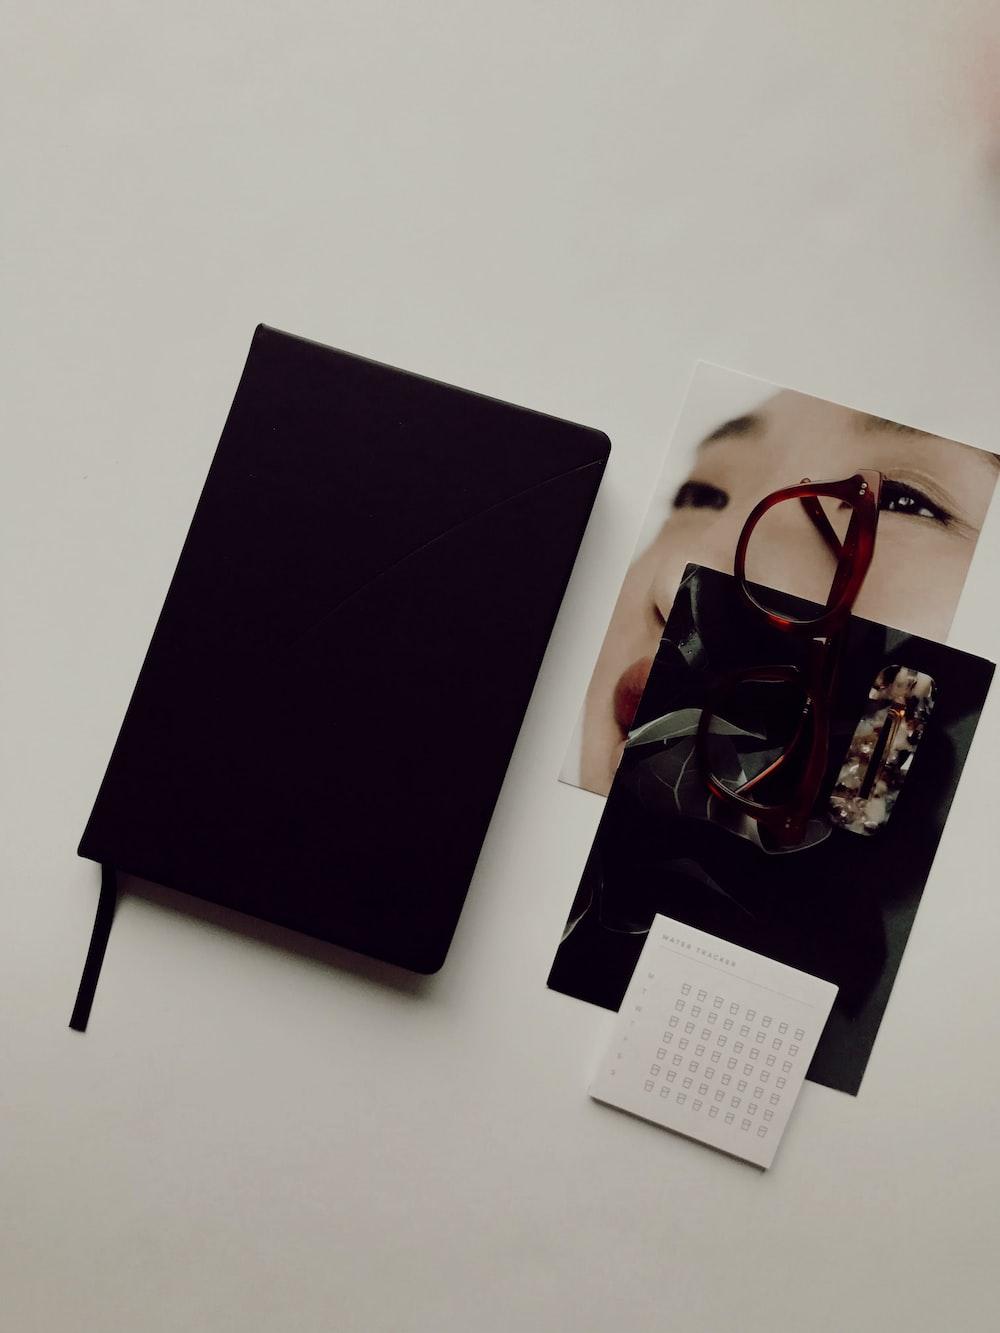 black book besides brown eyeglasses and photos